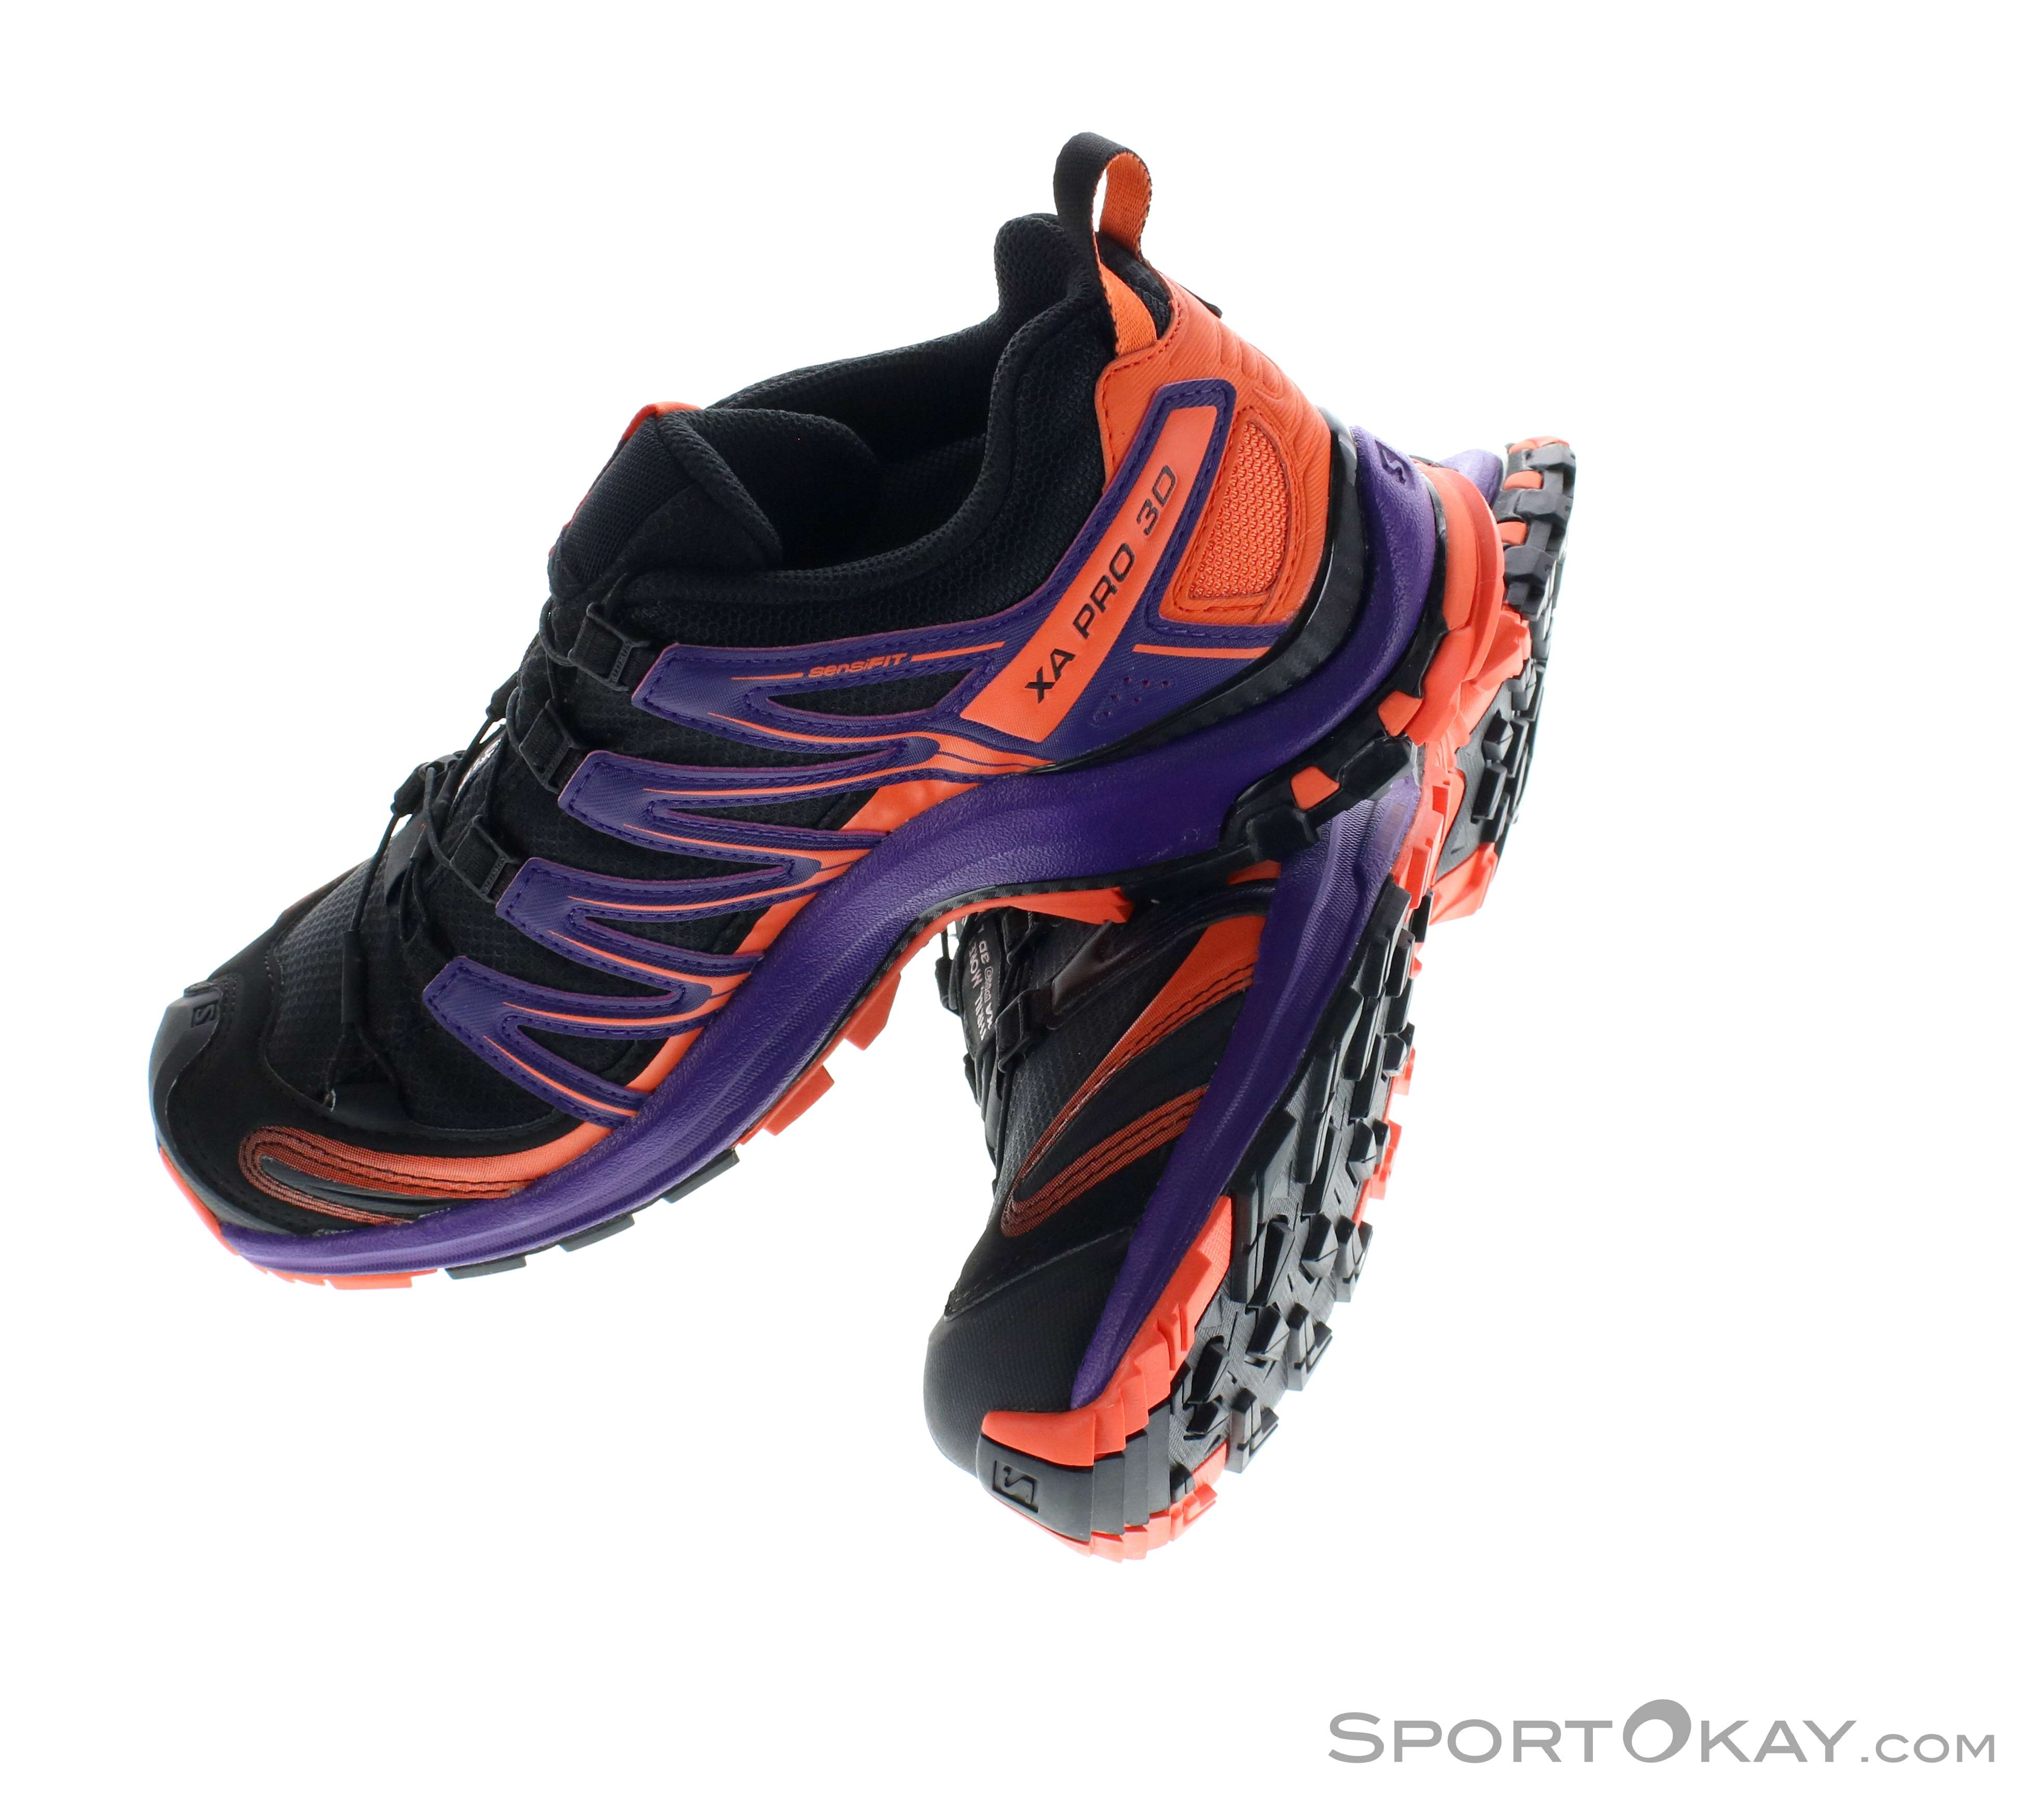 Salomon XA Pro 3D GTX Donna Scarpe da Trail Running Gore Tex